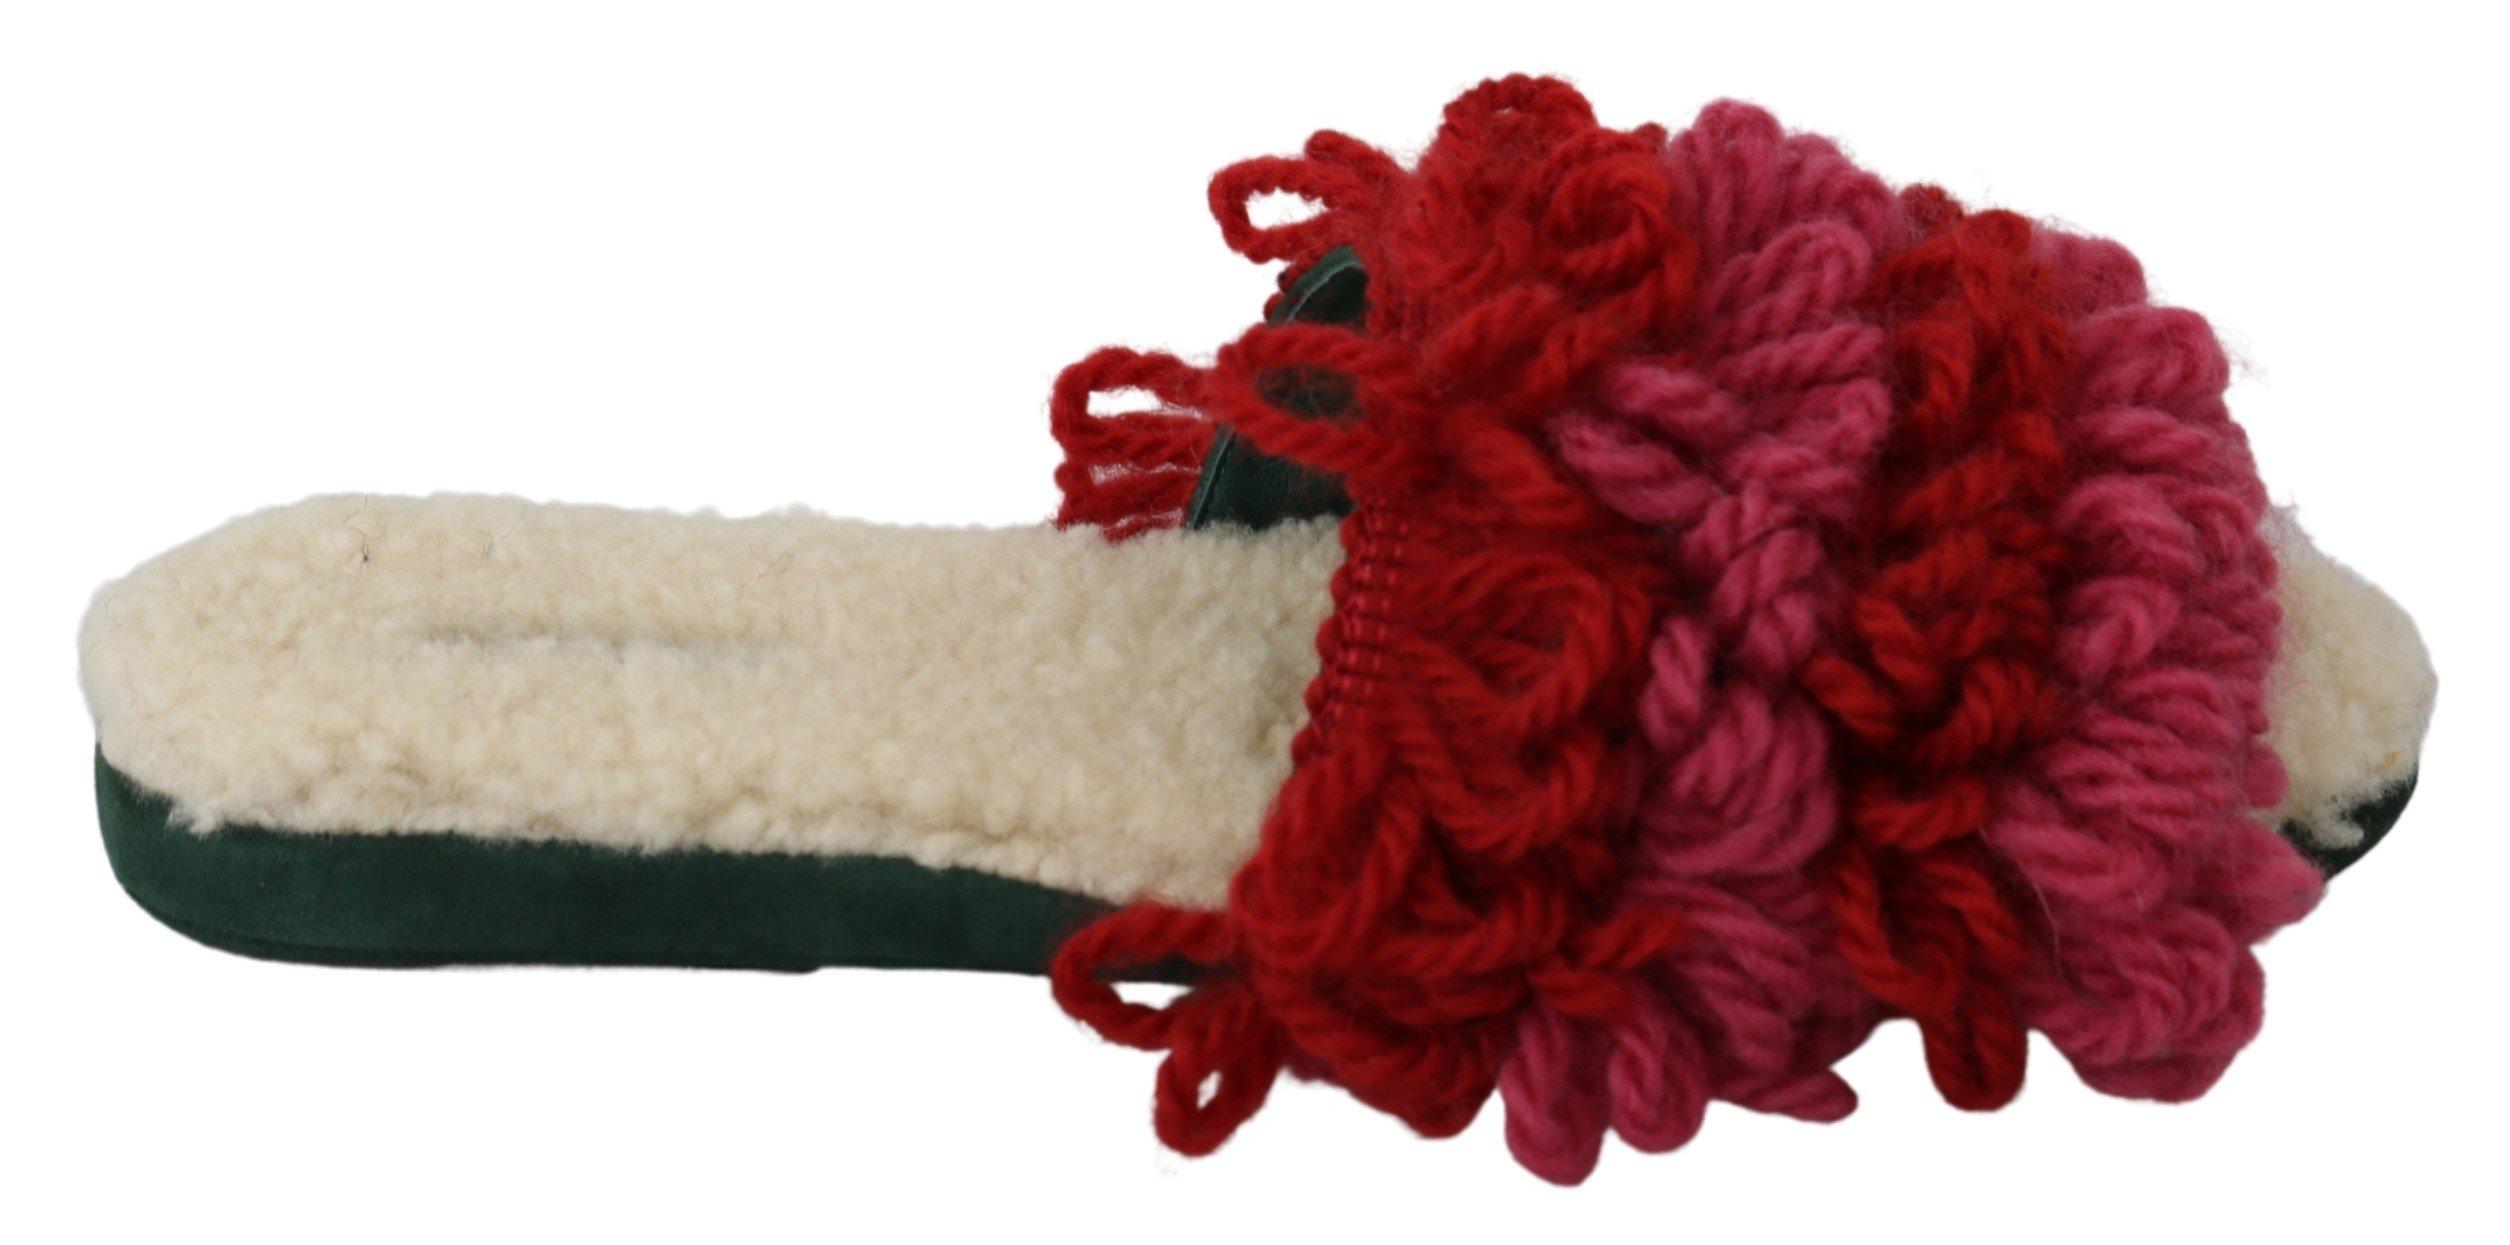 Dolce & Gabbana Women's Suede Shearling Slippers Red LA6895 - EU39/US8.5